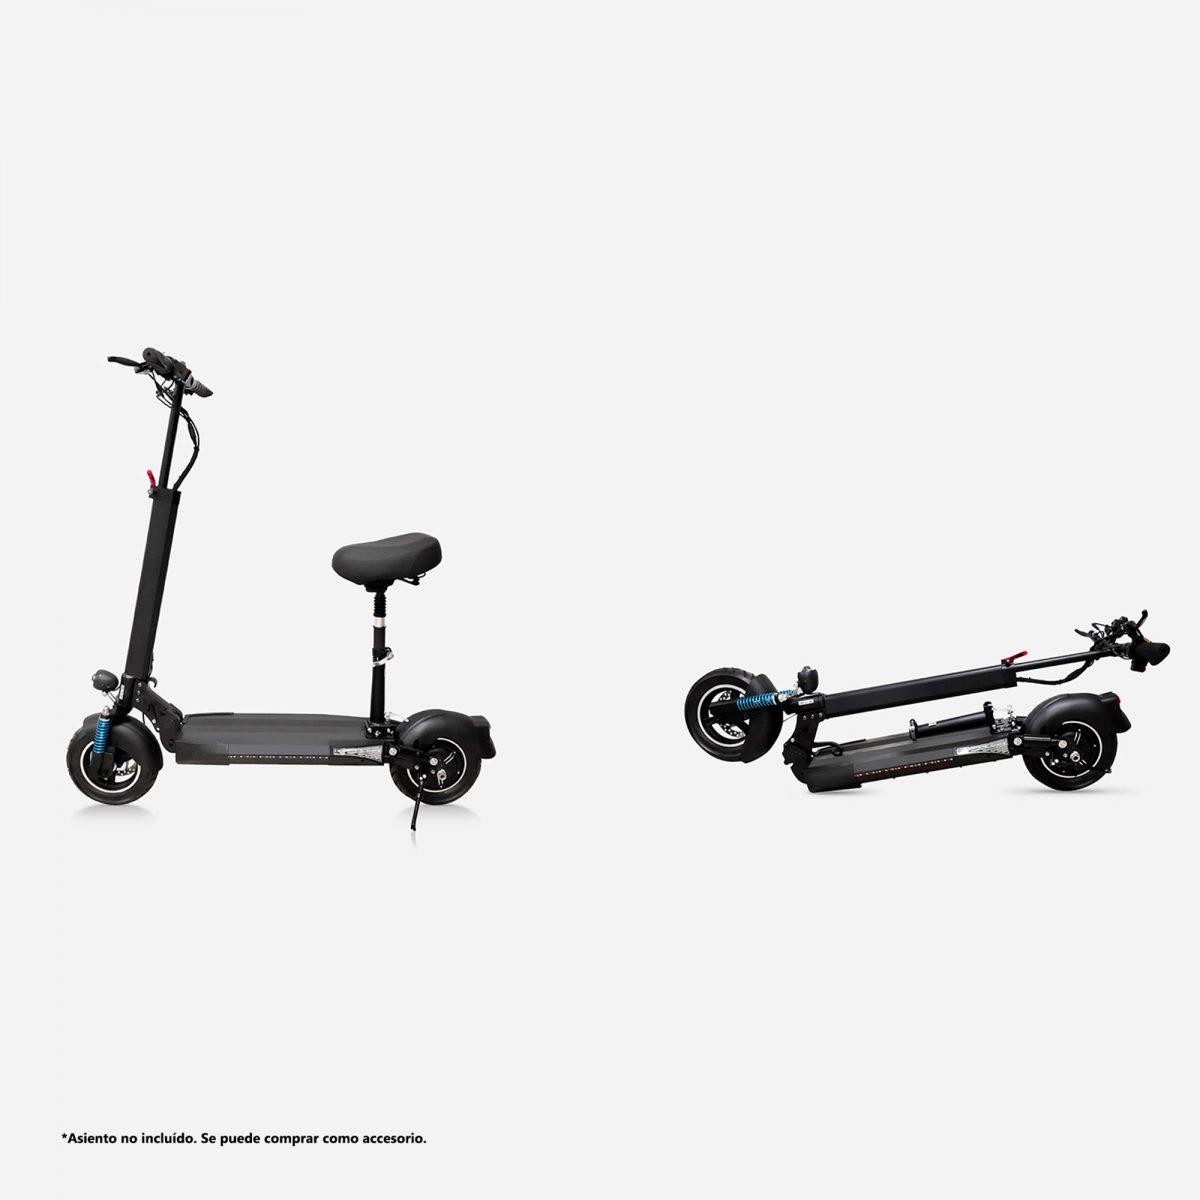 patinete eléctrico Zrino - Zwheel